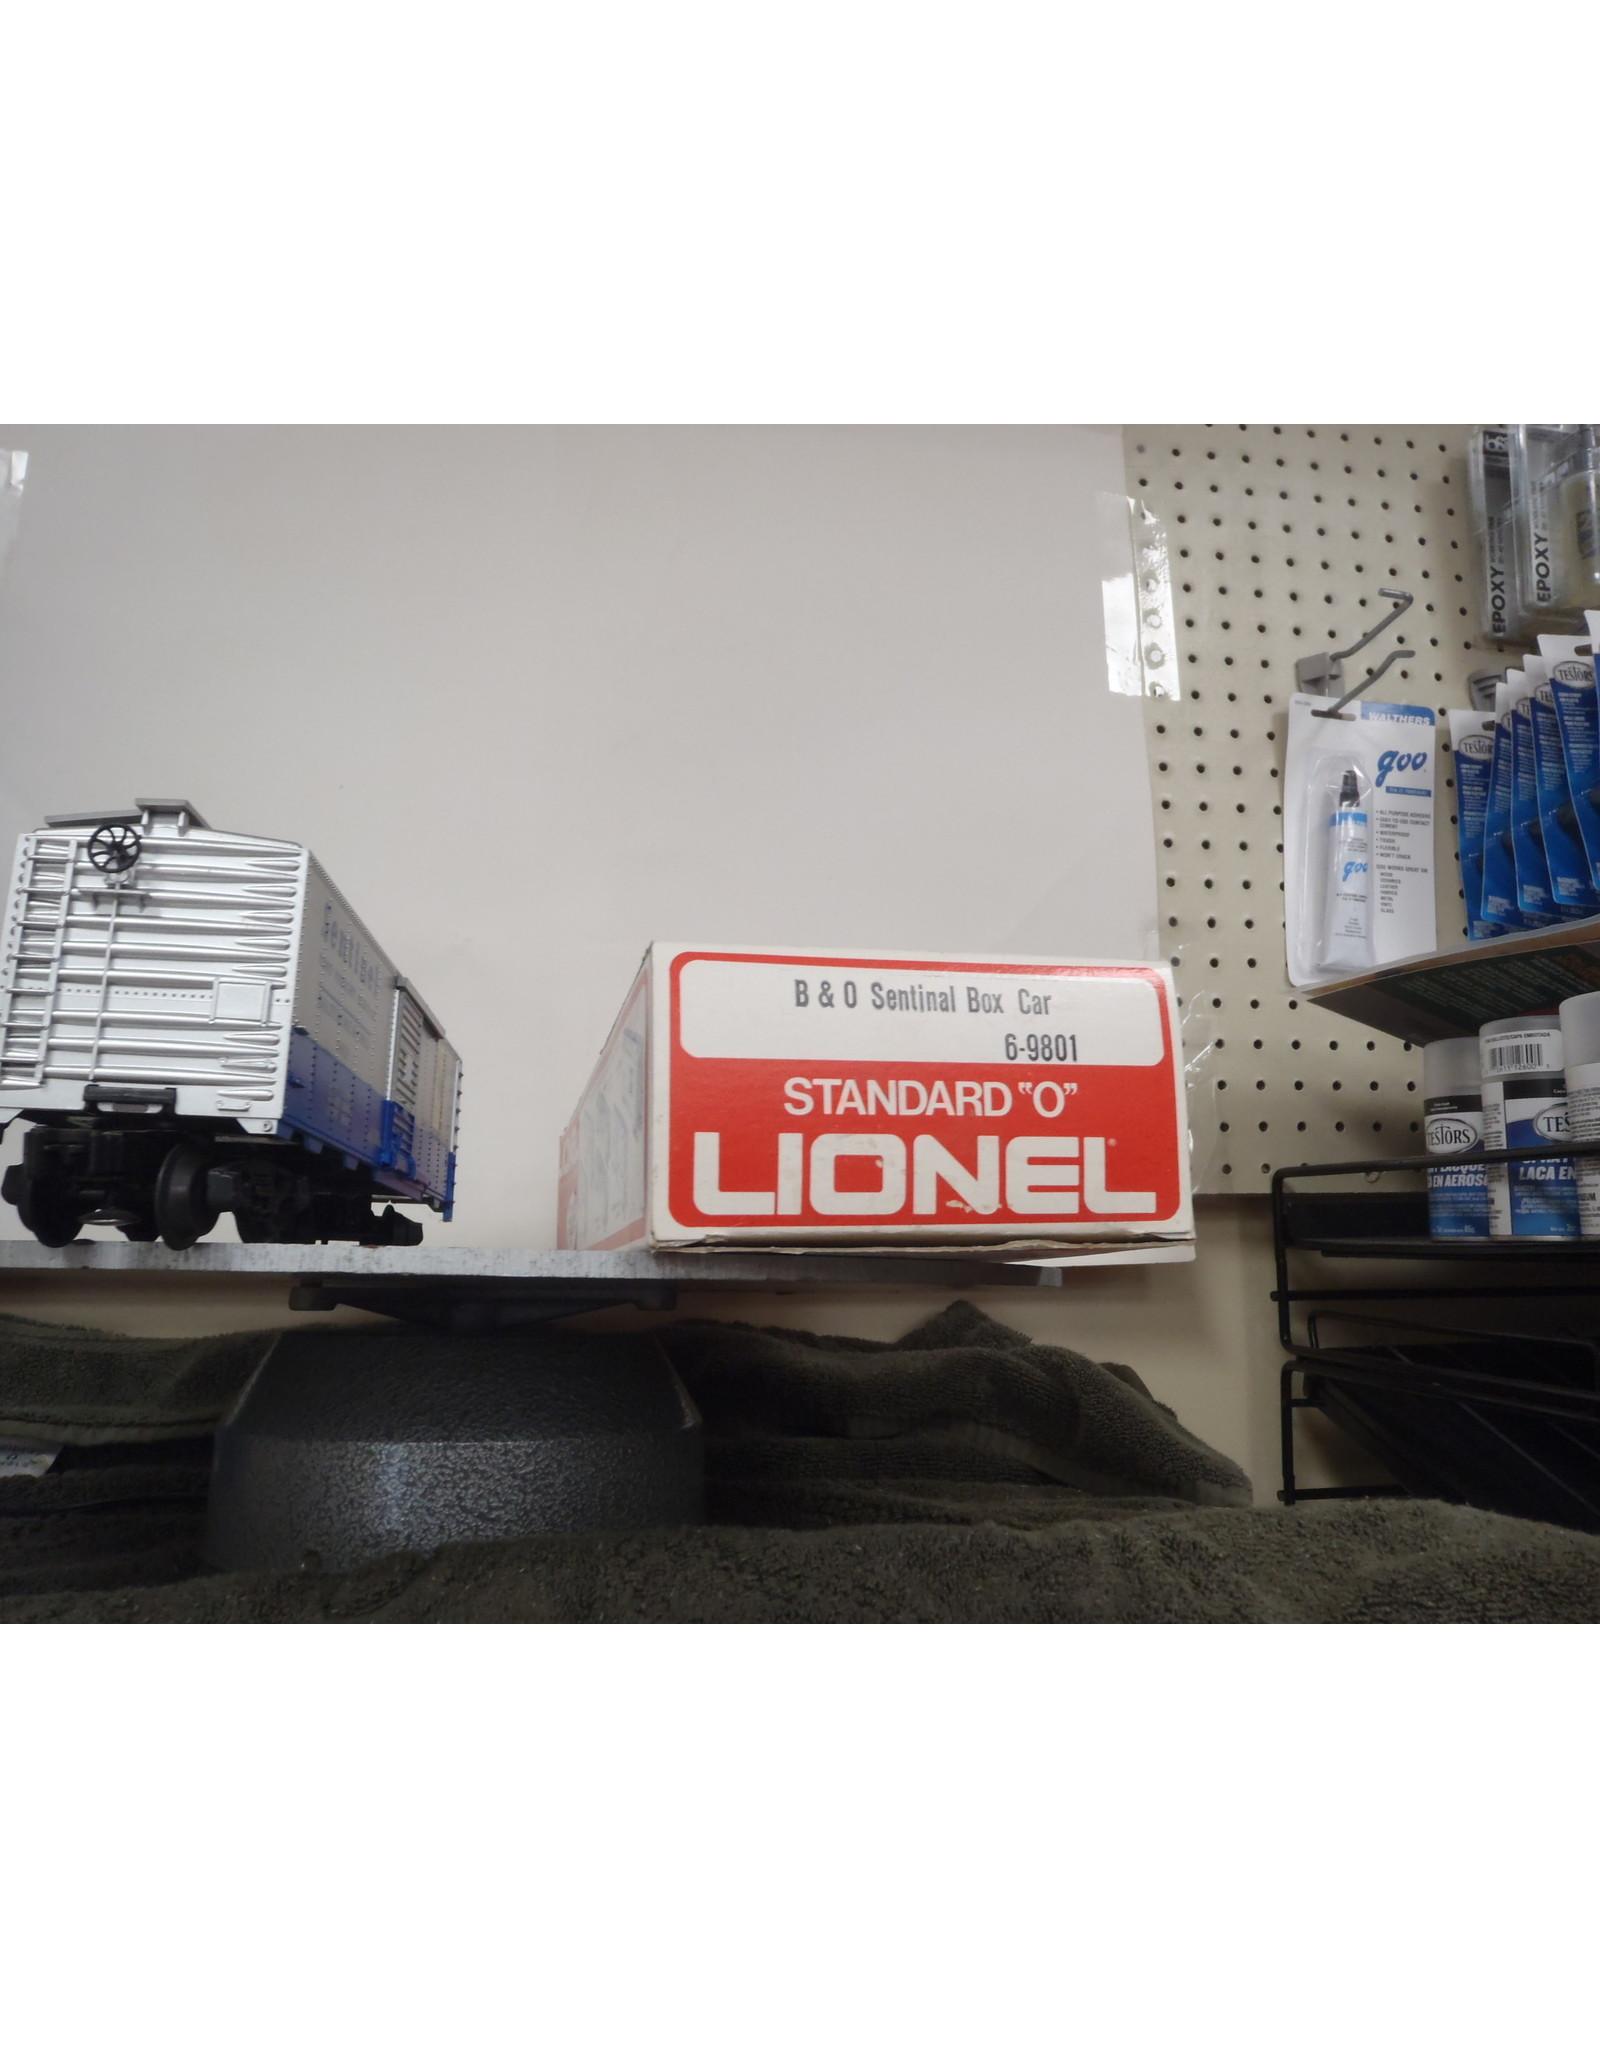 Lionel Boxcar B&O Sentinal 9801